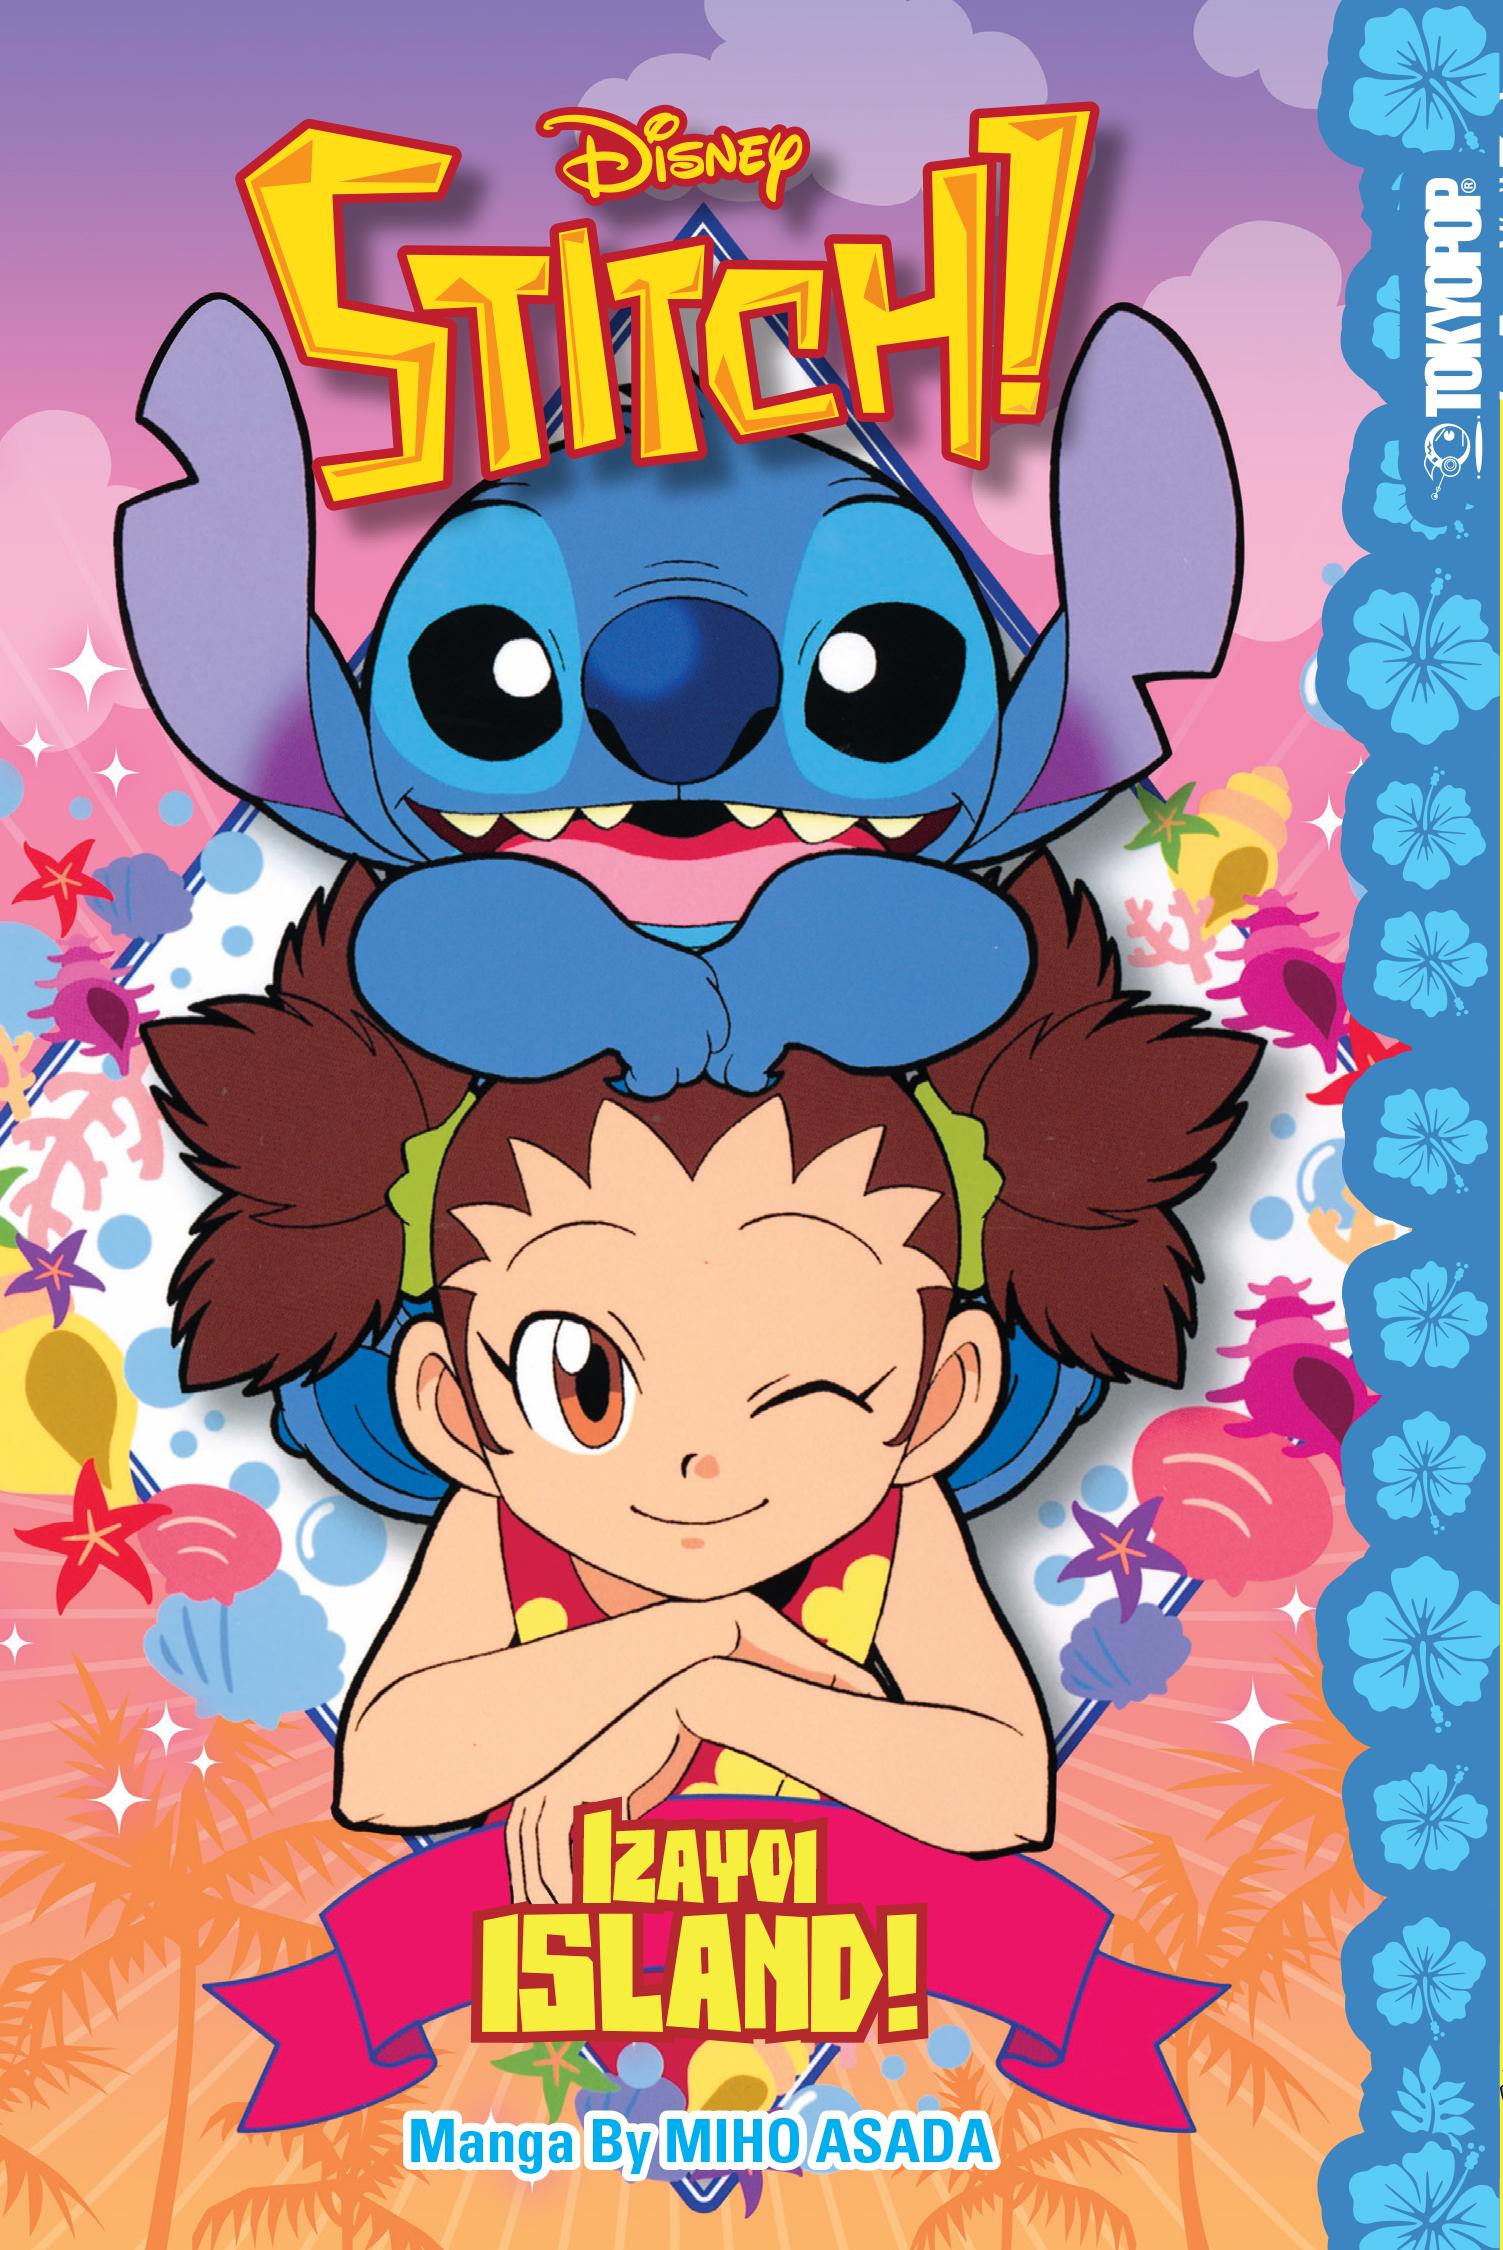 Disney Manga: Stitch! Izayoi Island! (ebook exclusive)